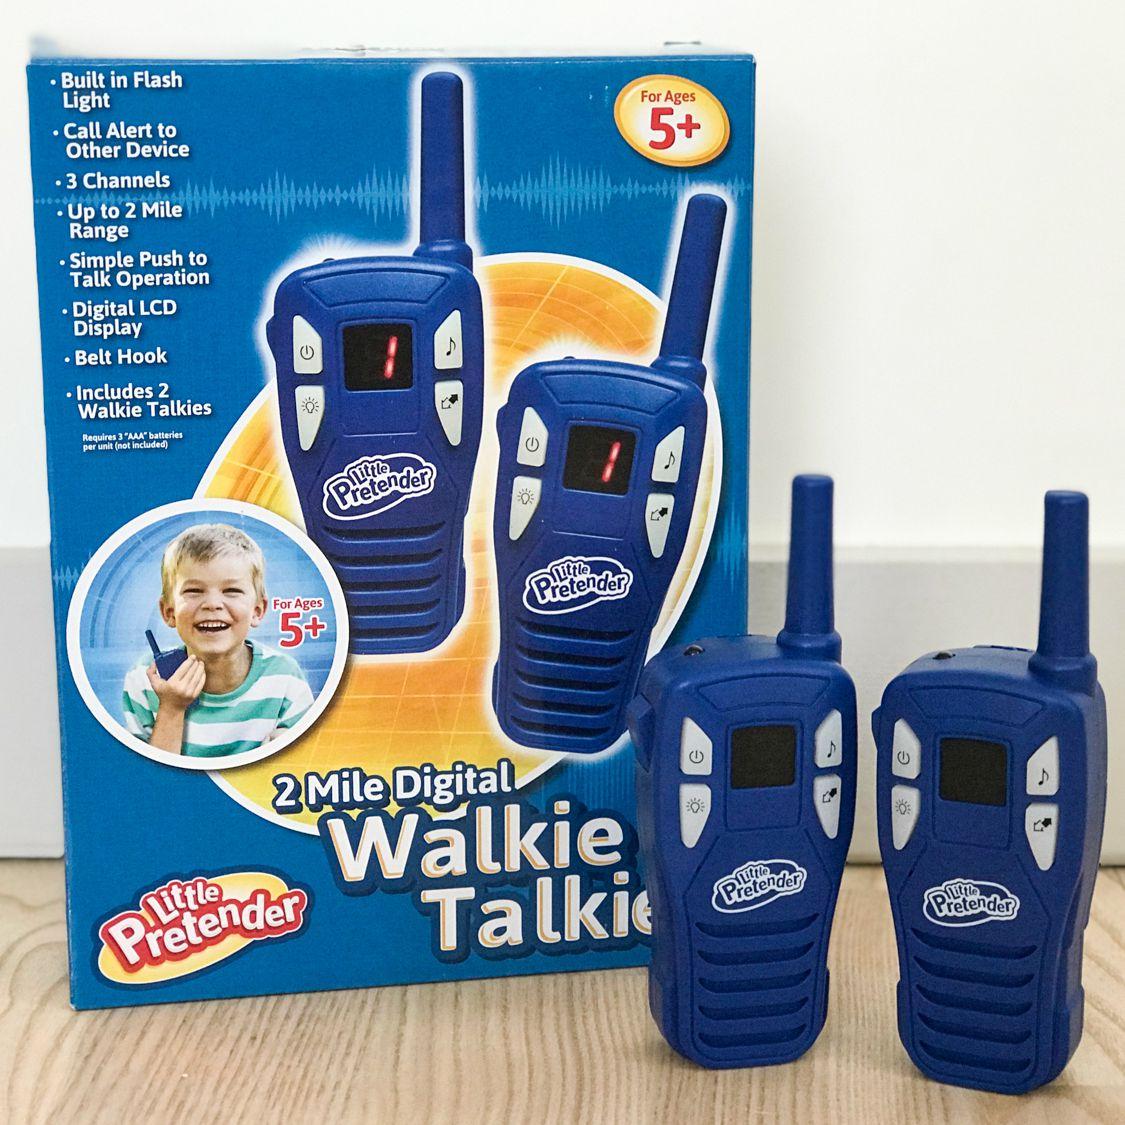 WALKIE TALKIE BATTERIES NOT INCLUDED, SIMPLE USE BASIC BEGINNERS